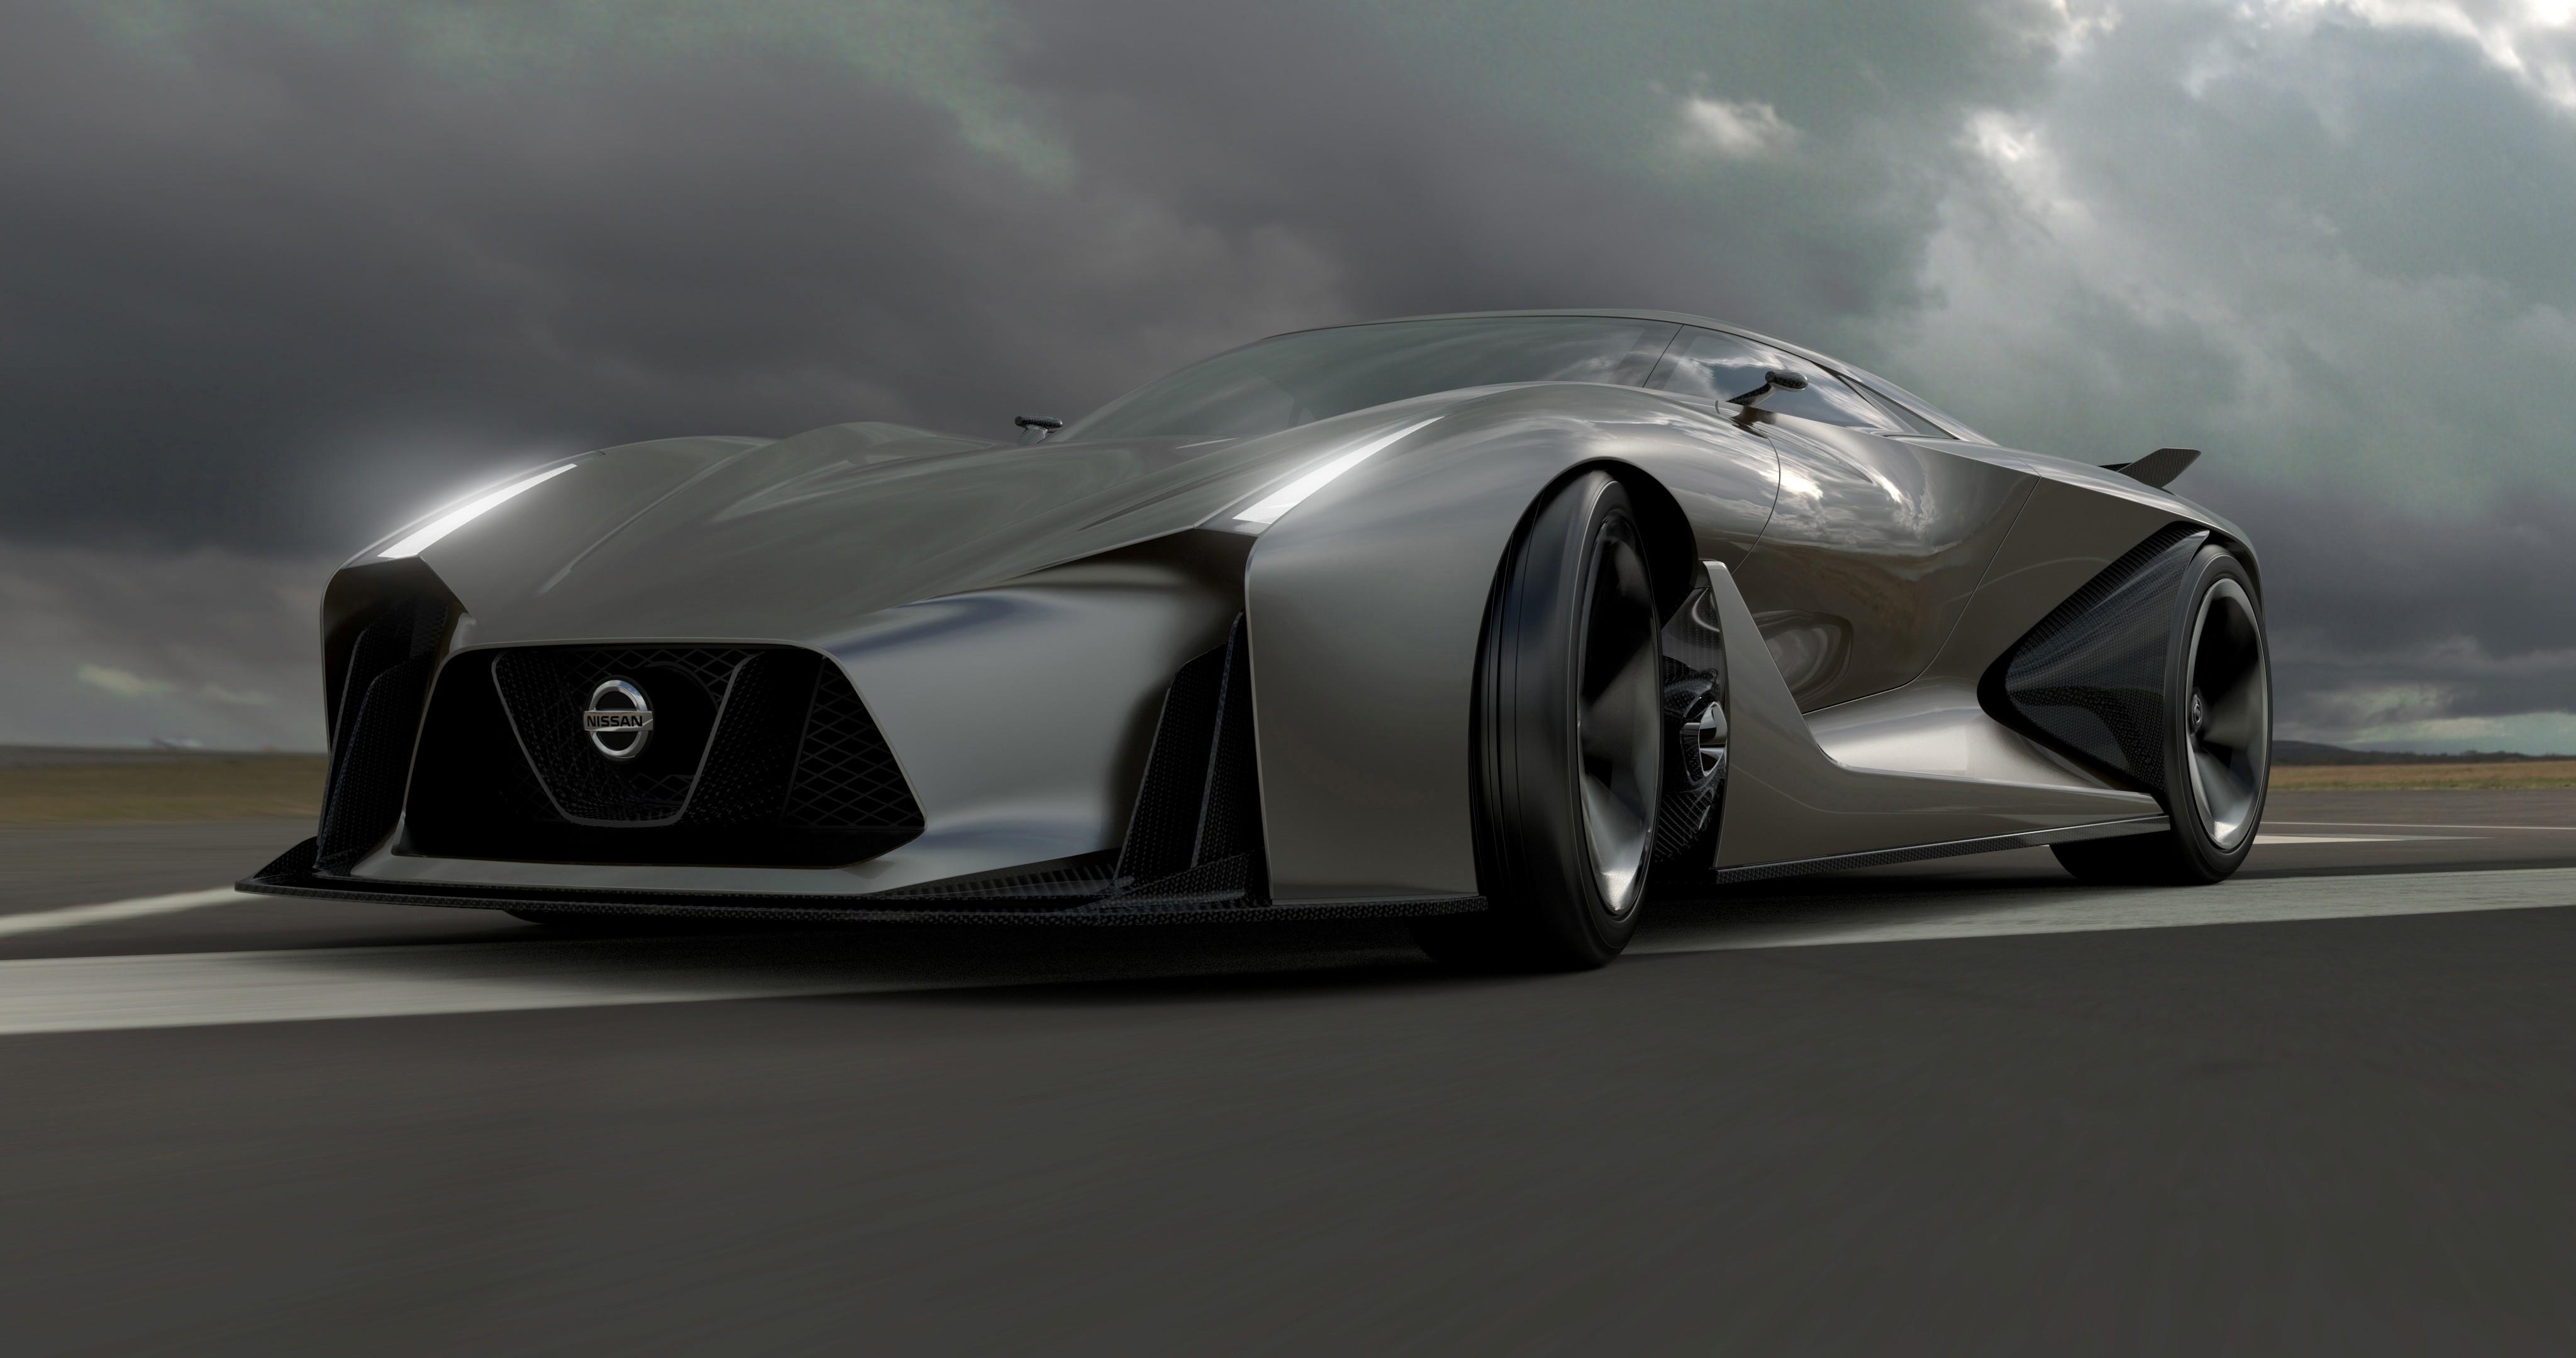 nissan-concept-2020-vision-gran-turismo-sony-playstation-0-100_1